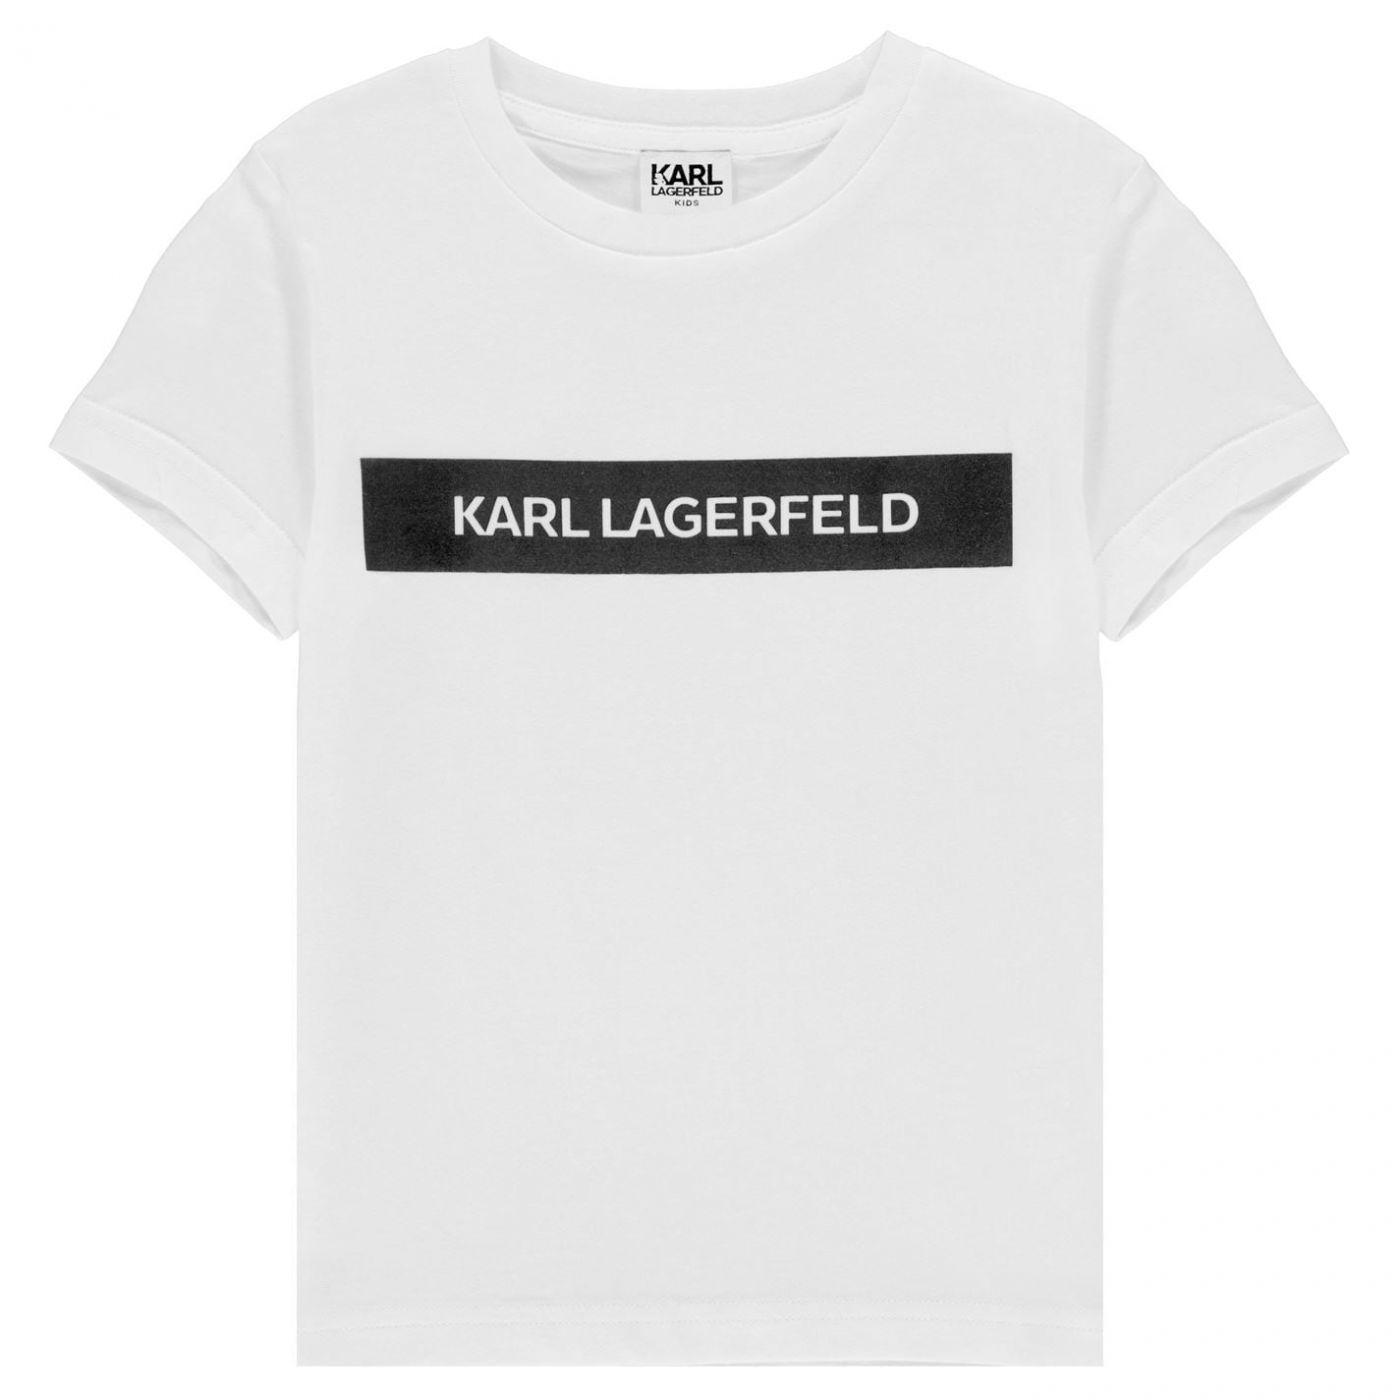 Karl Lagerfeld Multi Theme T Shirt